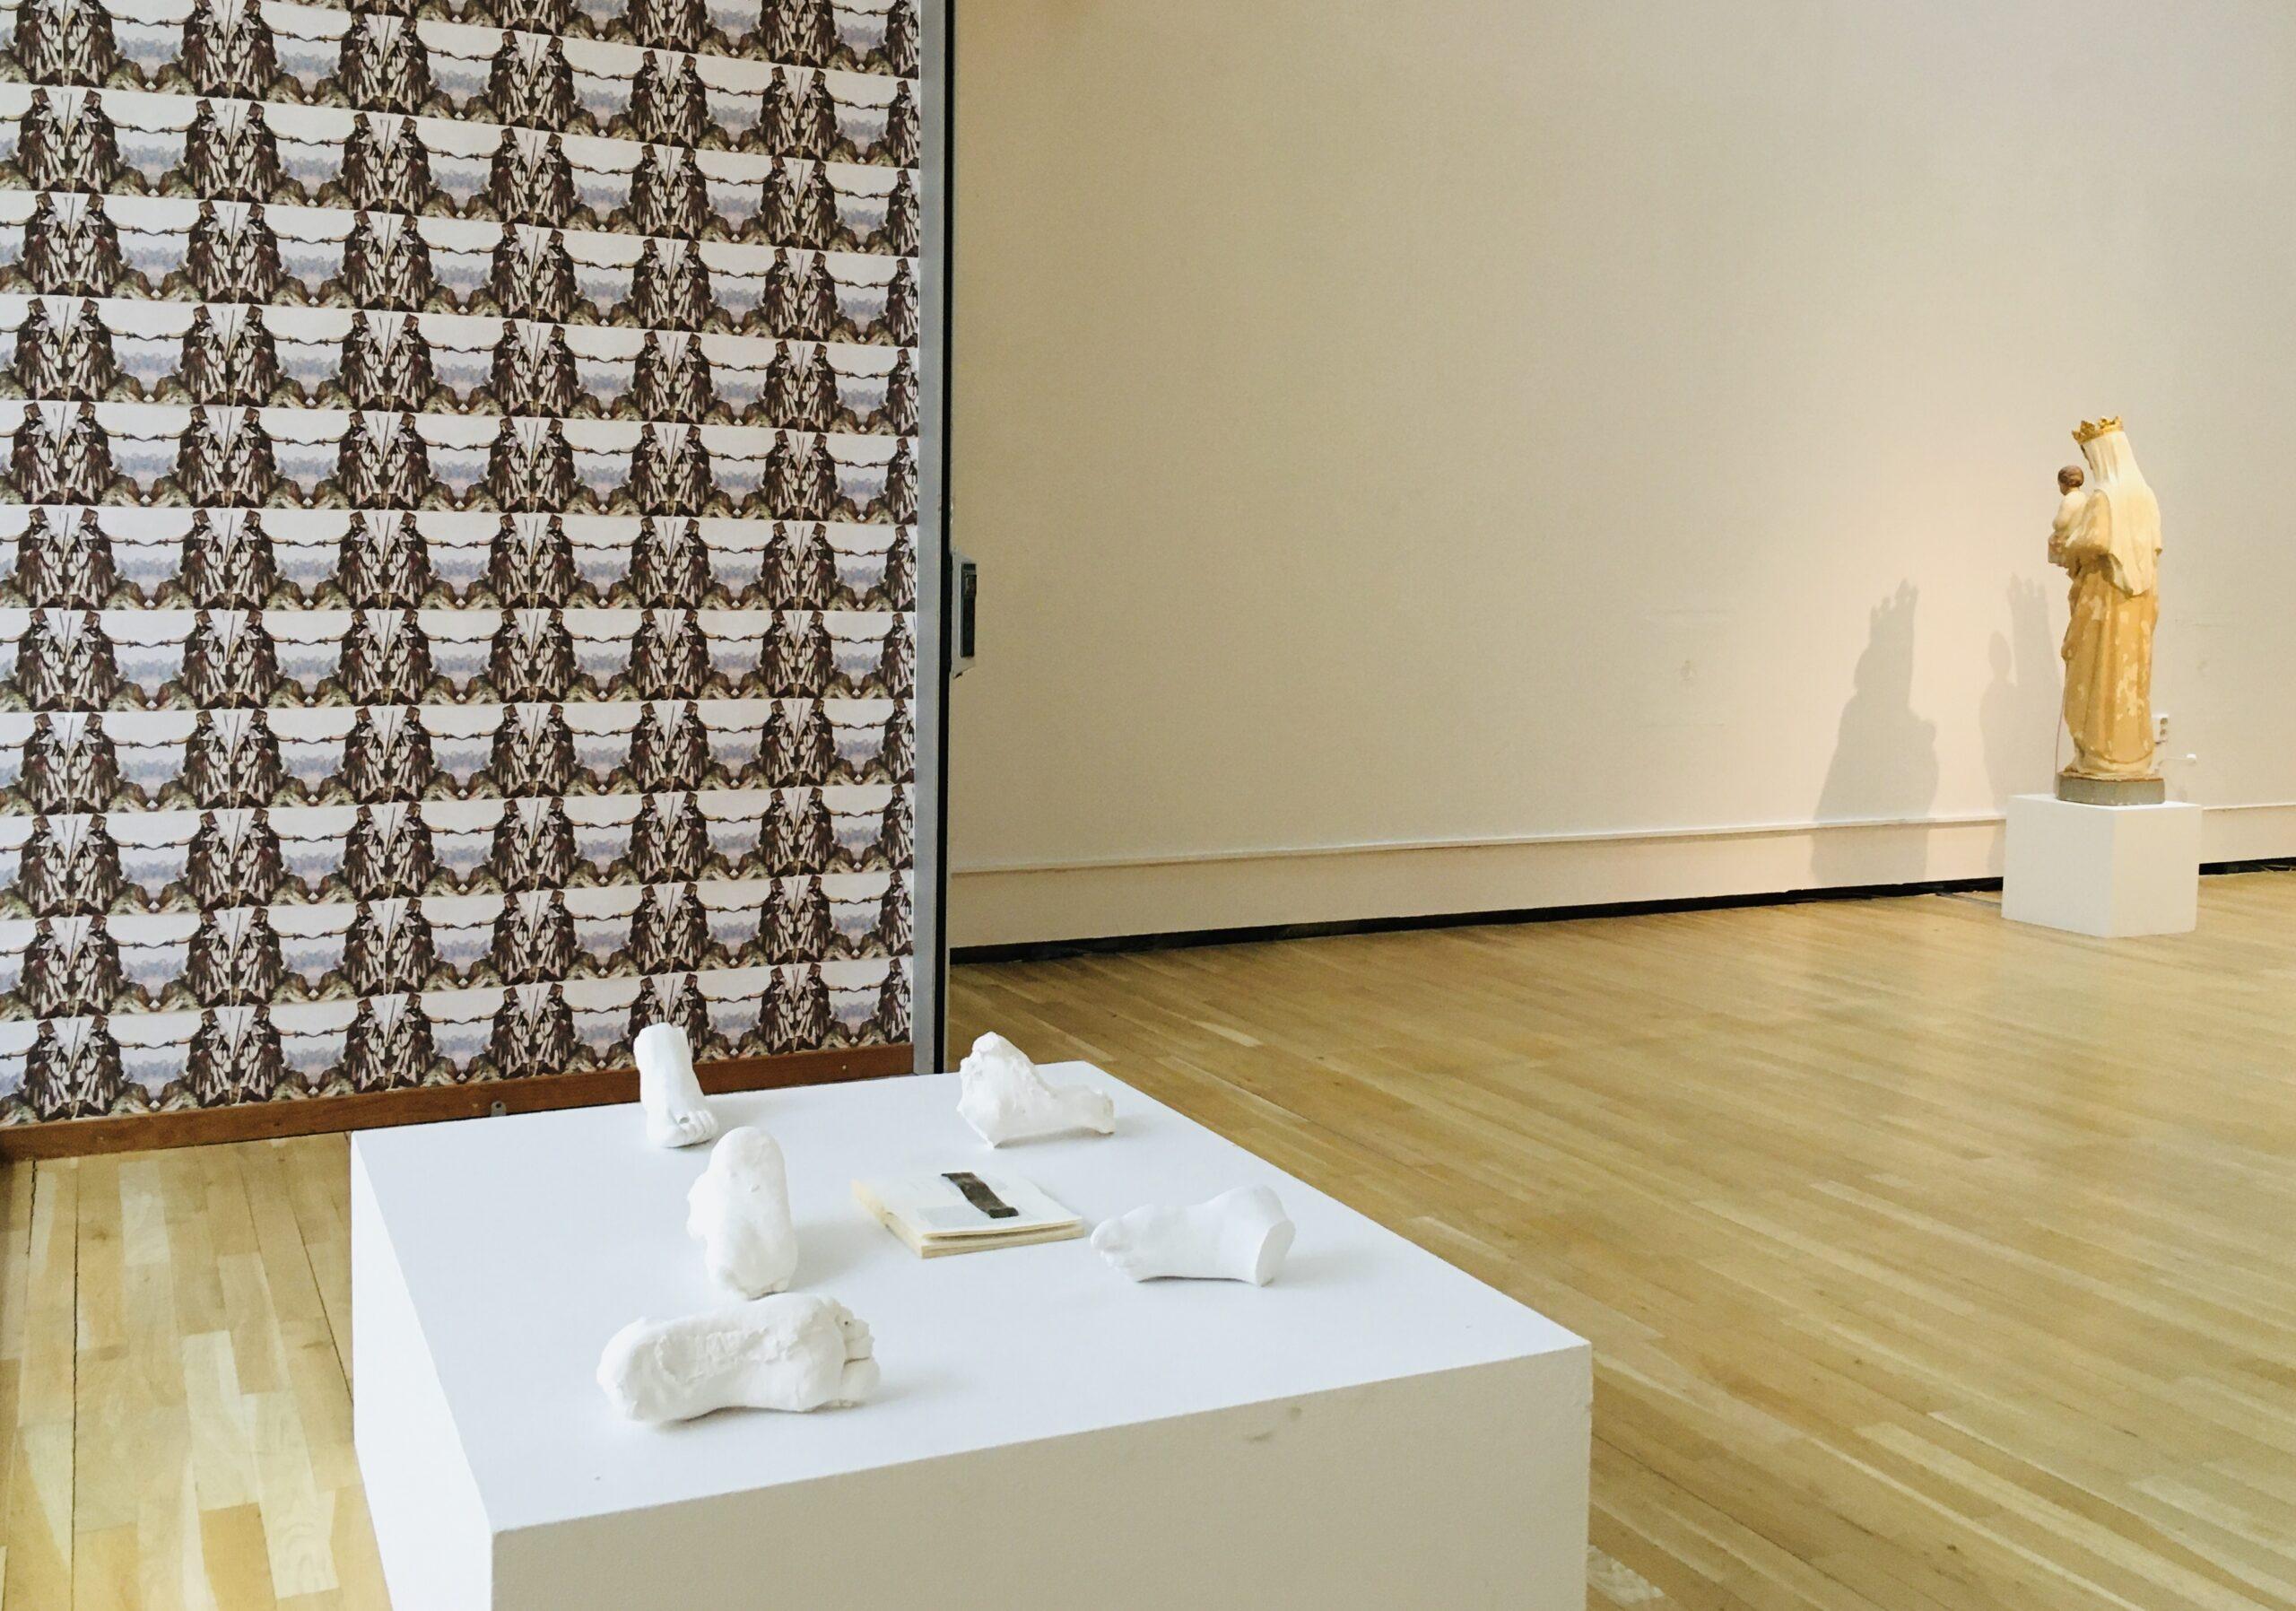 Amina Zoubir installation